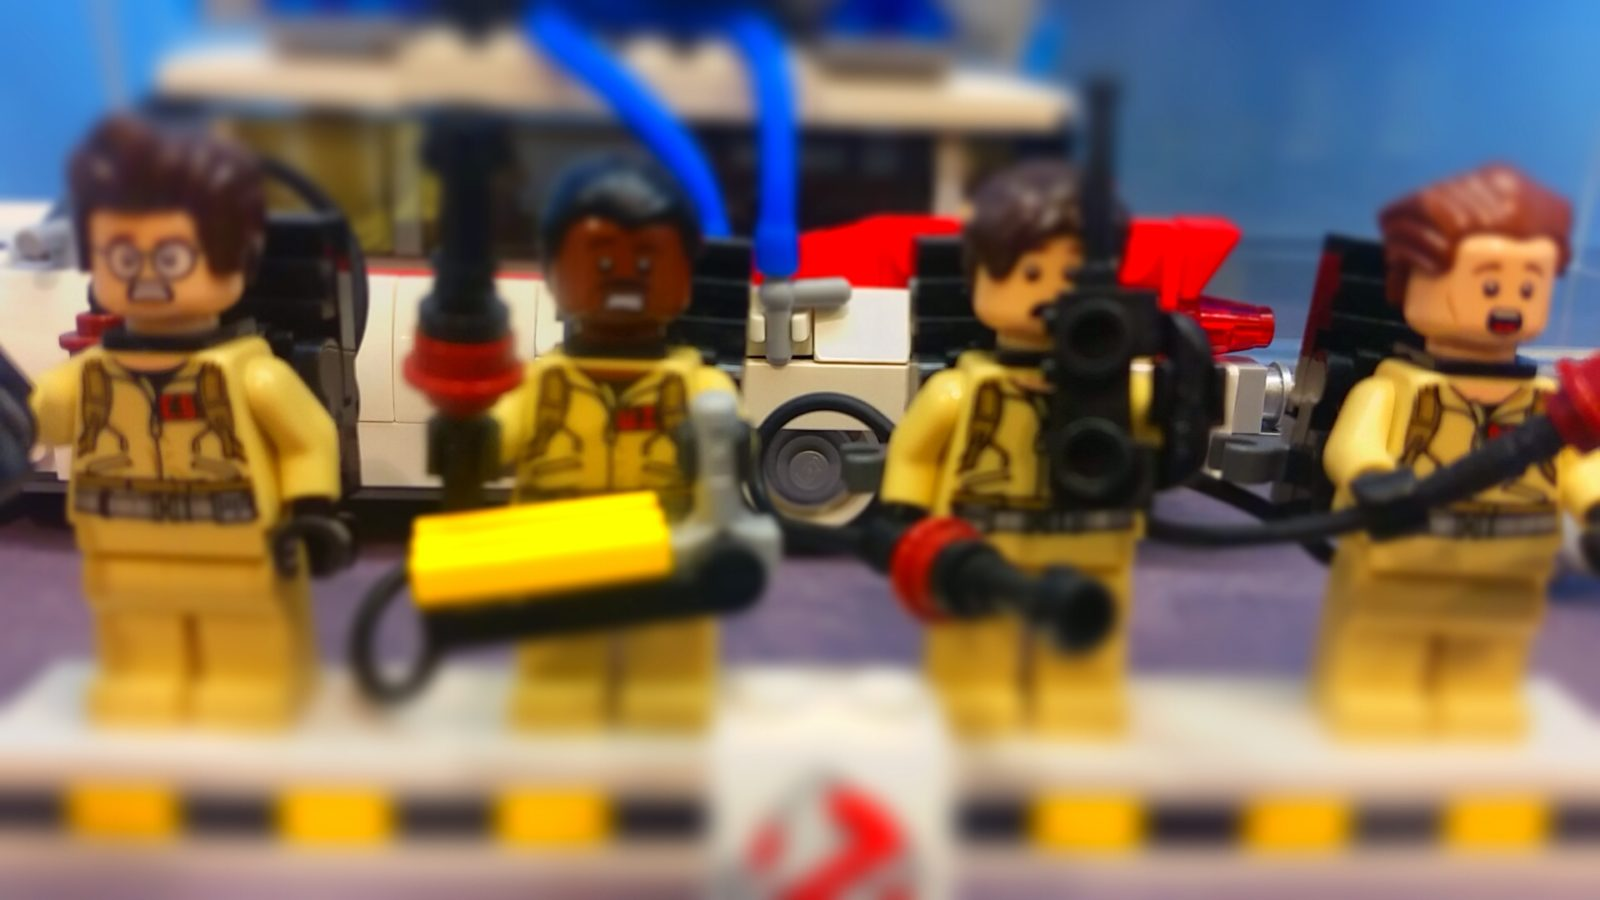 The Magic of Lego Club in East Gwillimbury